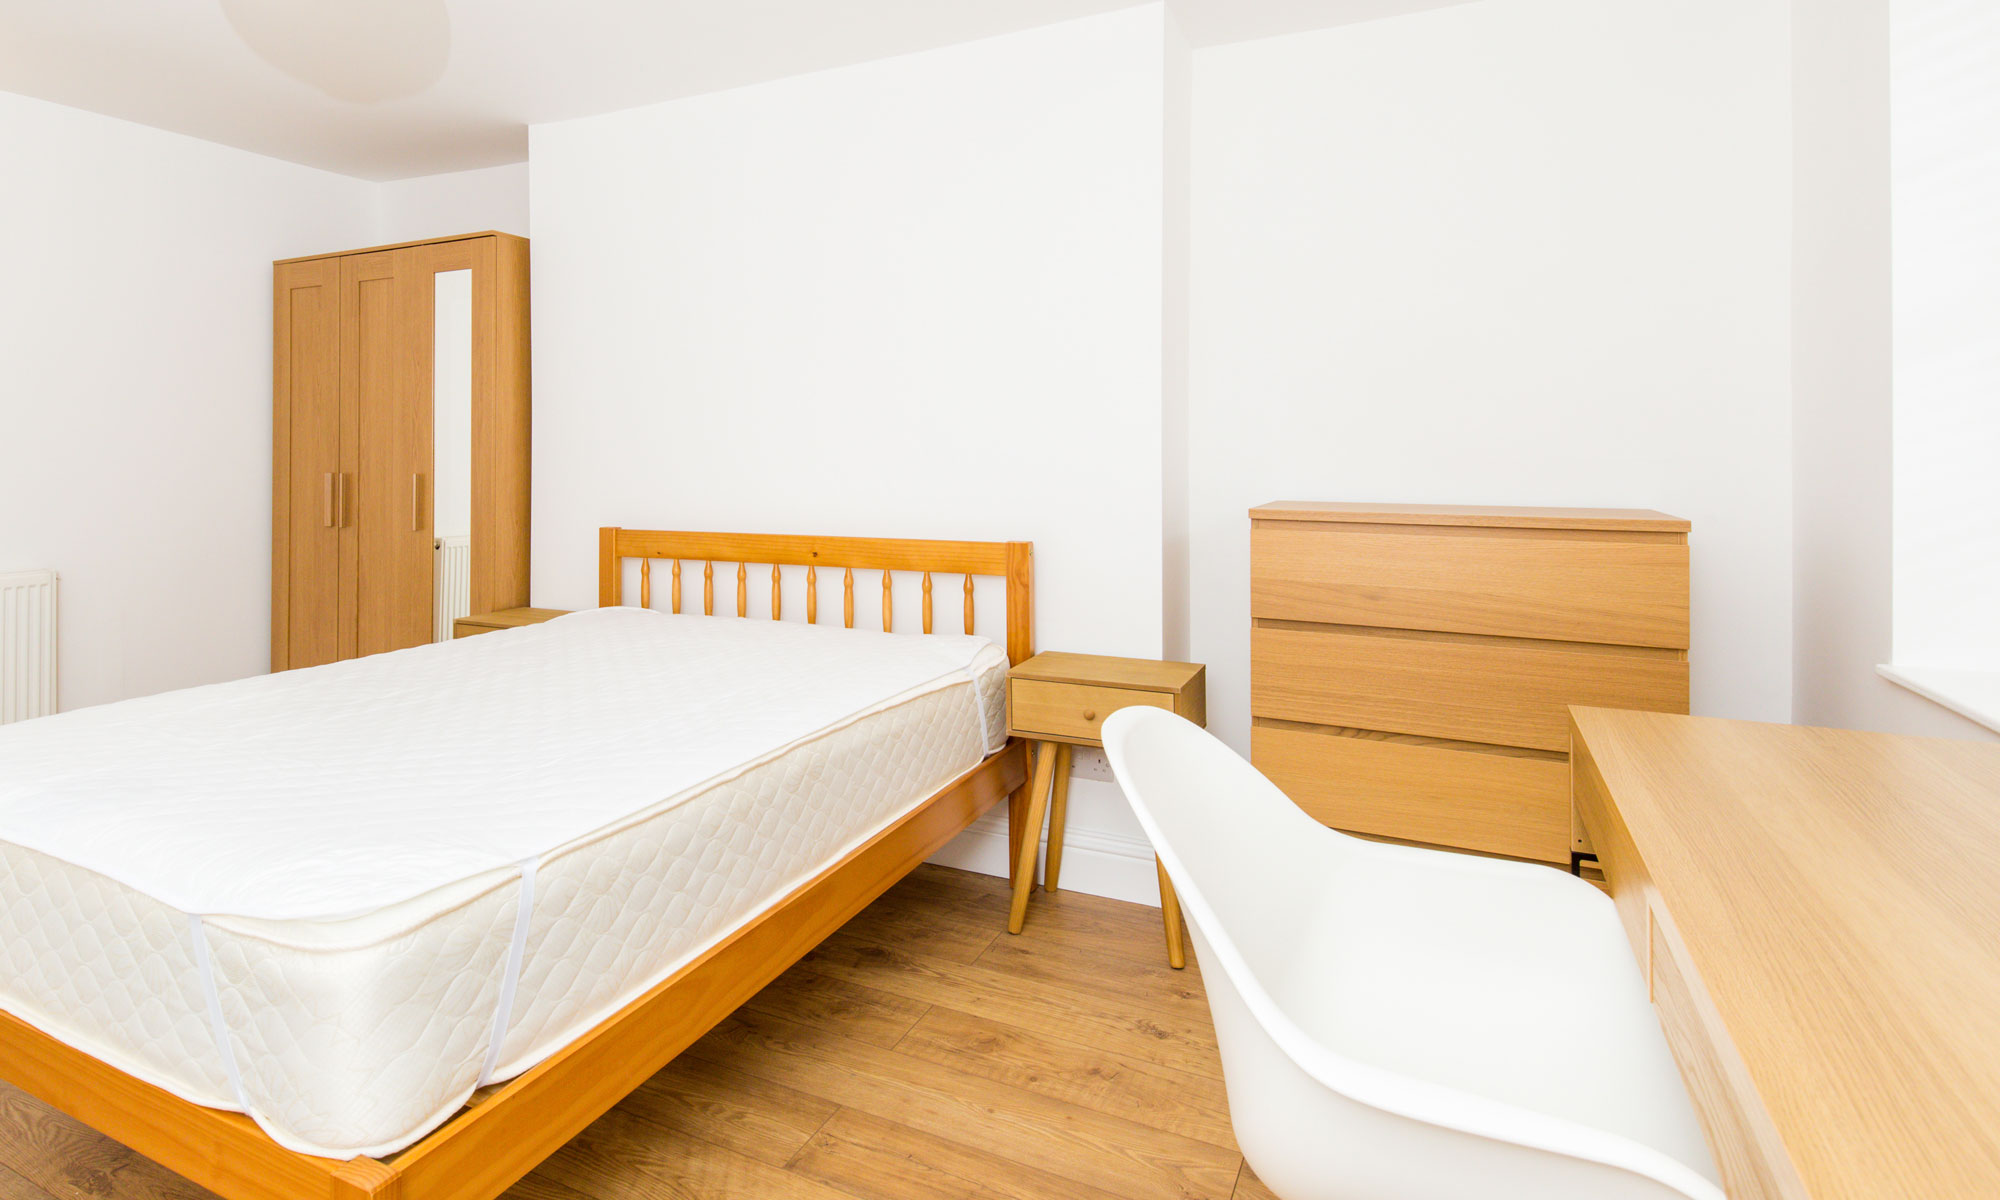 12-Bedford-square-1-bedroom-2